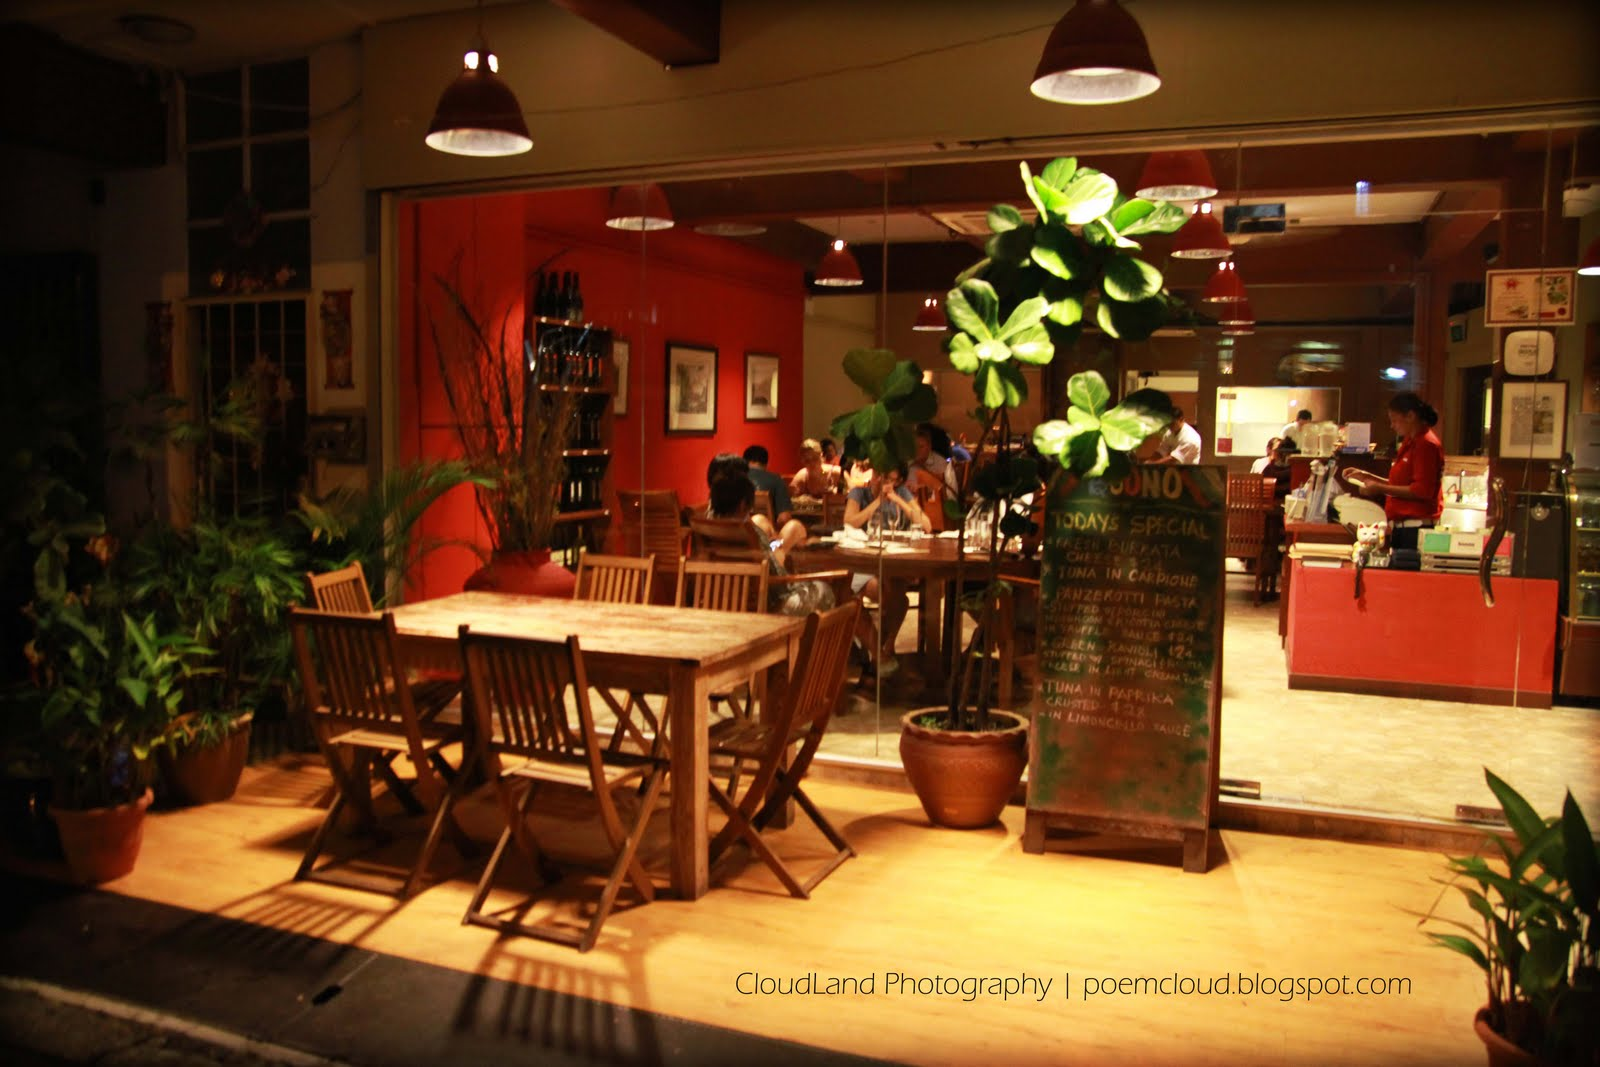 Cloudland buono pizza bar italian restaurant for Antonios italian cuisine